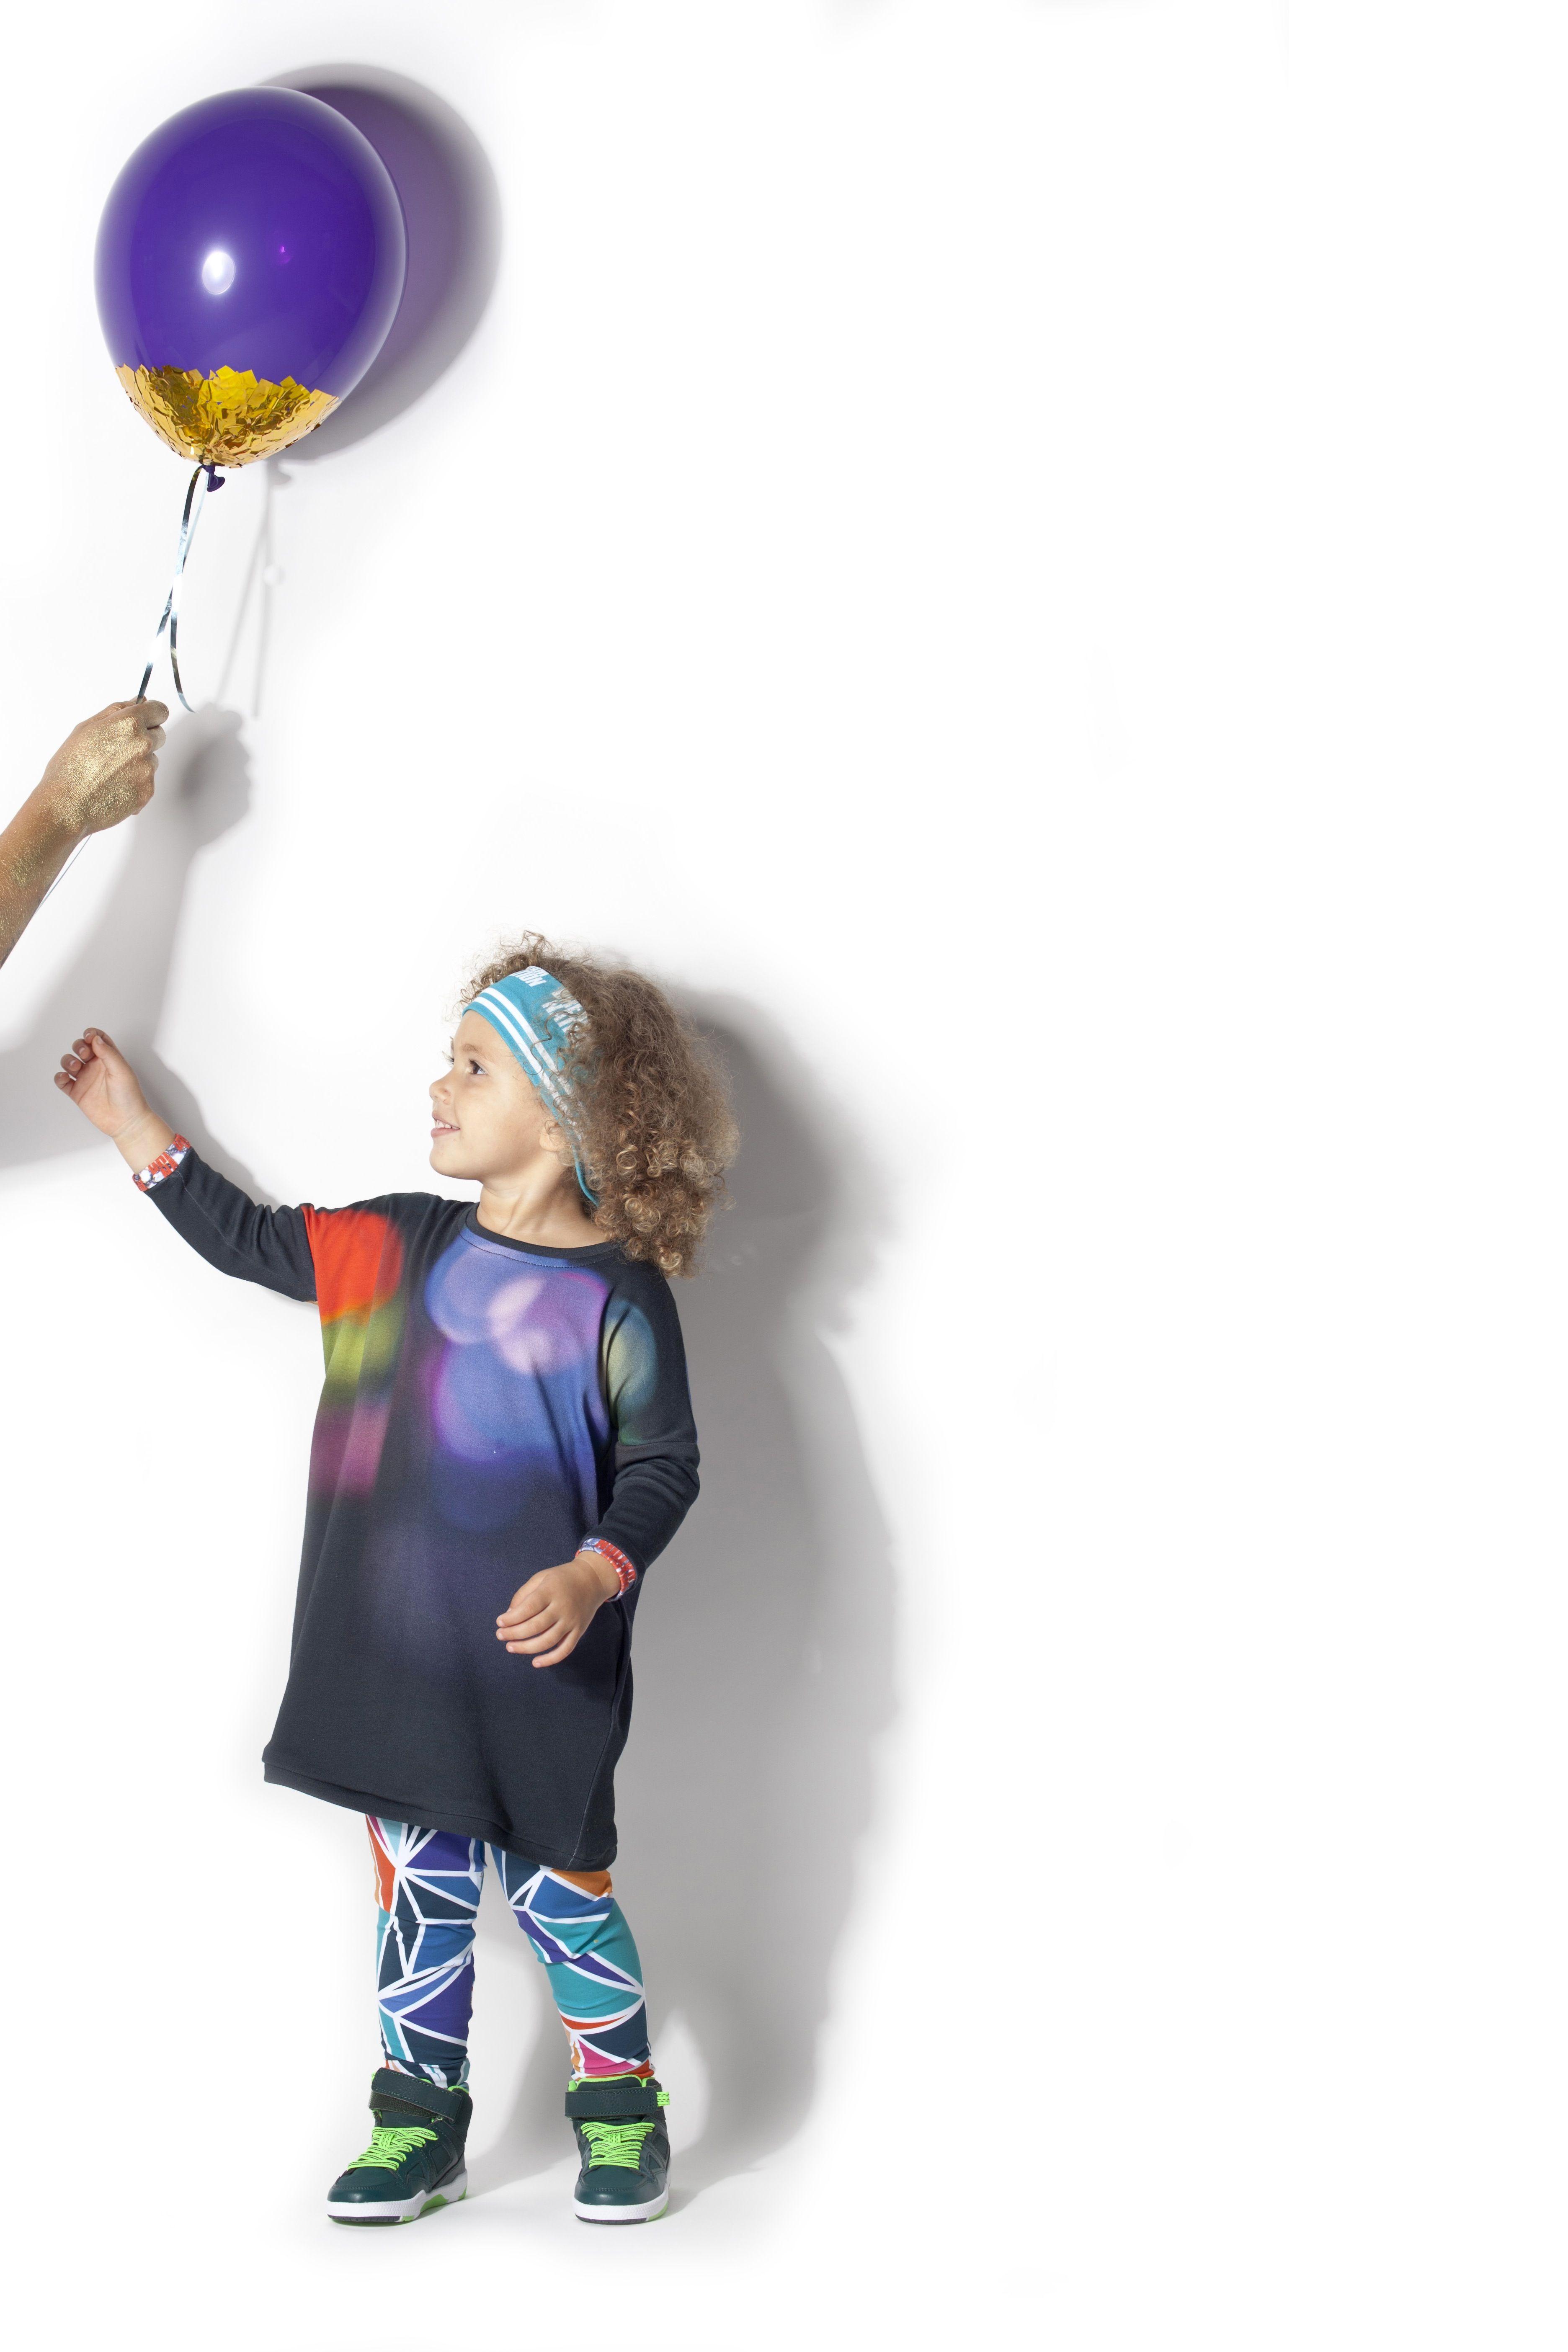 BLING kids for little princesses ;)  #dreamnation #kidsfashion #aw14 #princess #blur #coolkids #streetwear